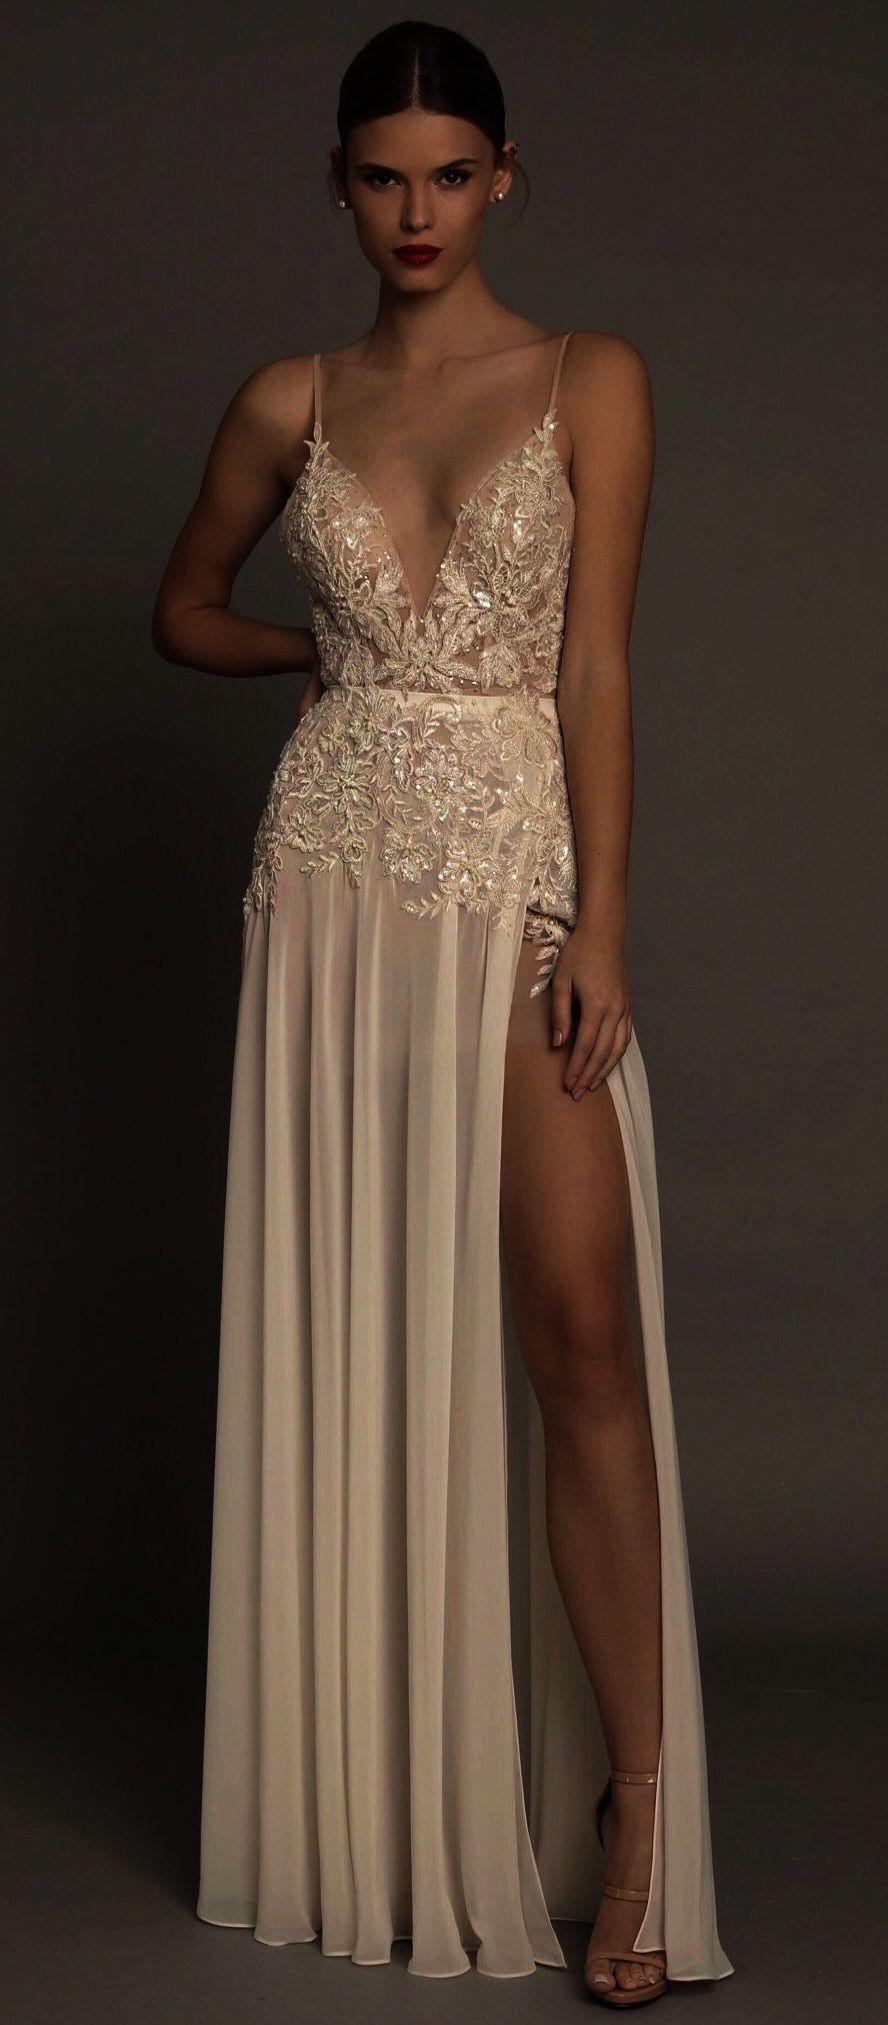 Long sleeve prom dresses plus size macyus short prom dress prom